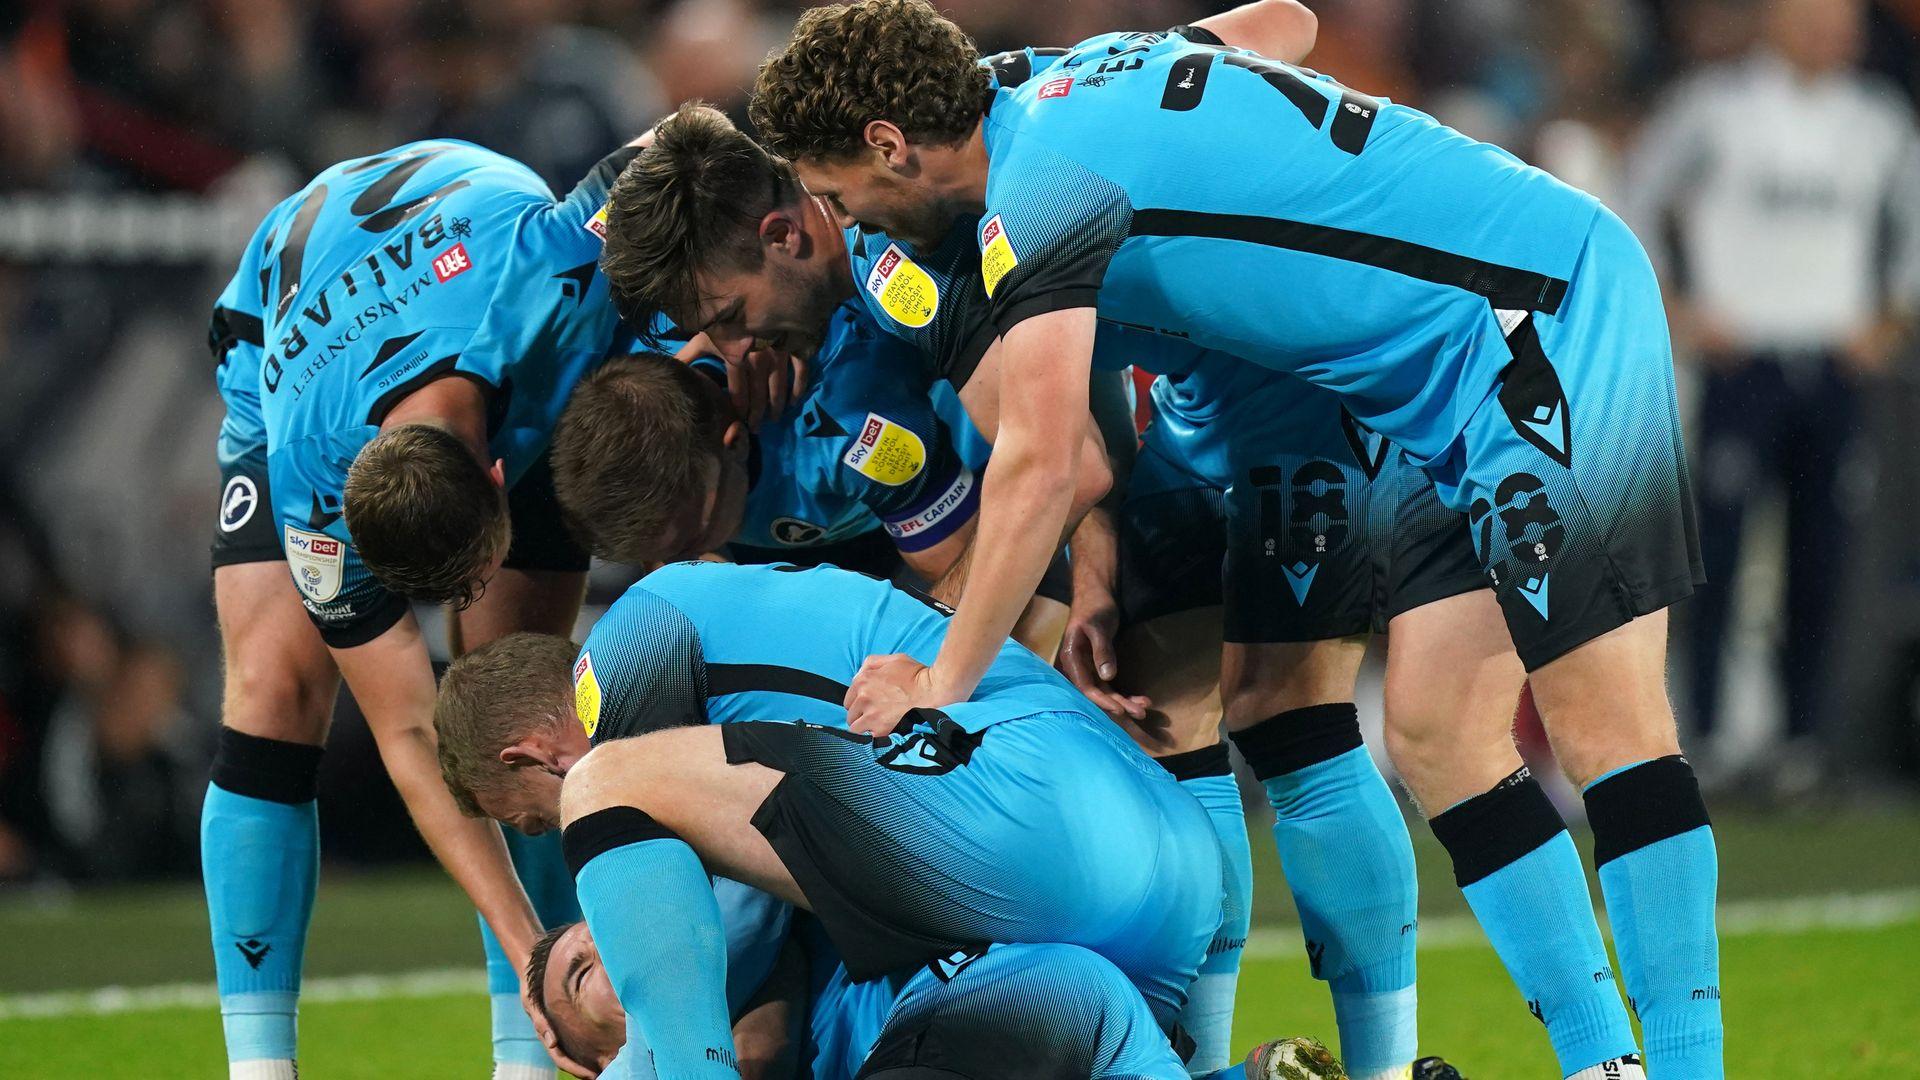 Millwall strike late to sink 10-man Sheff Utd